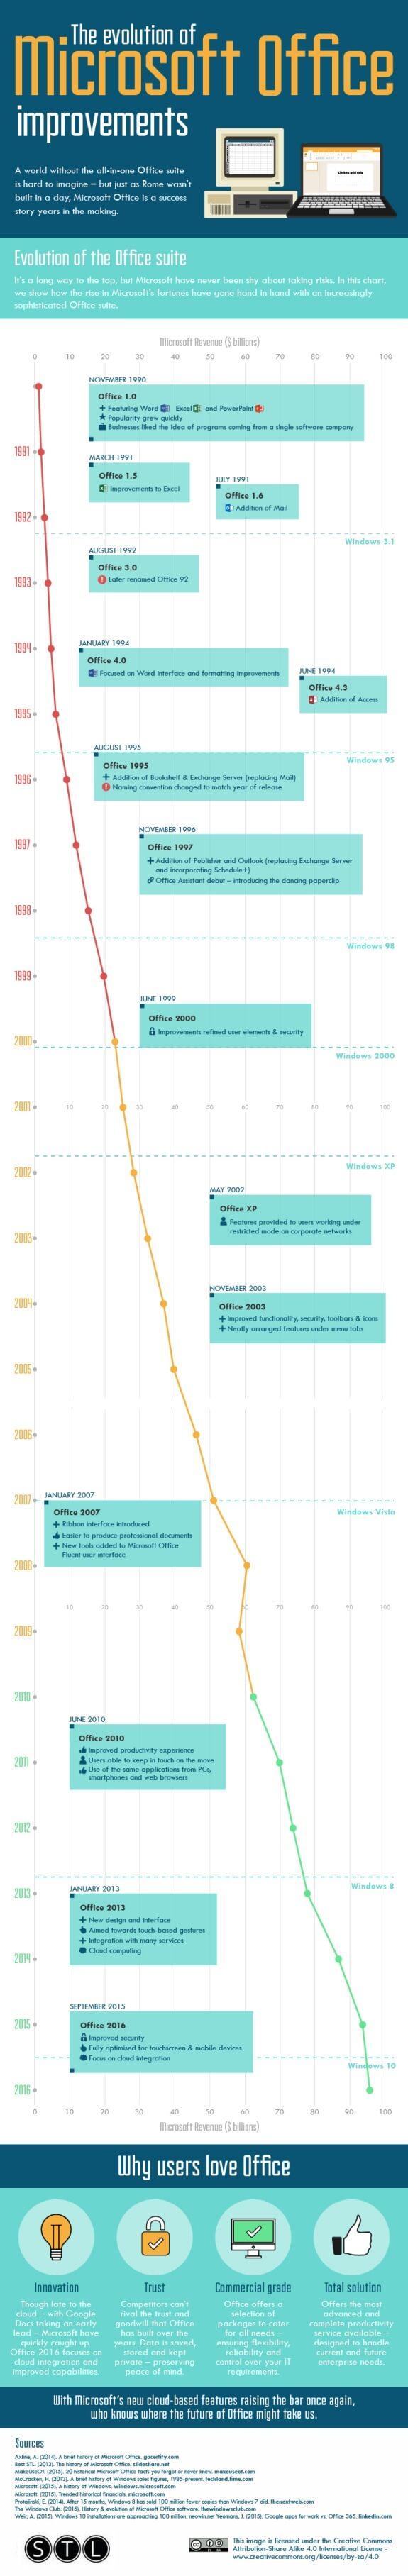 The Evolution of Microsoft Office Improvements